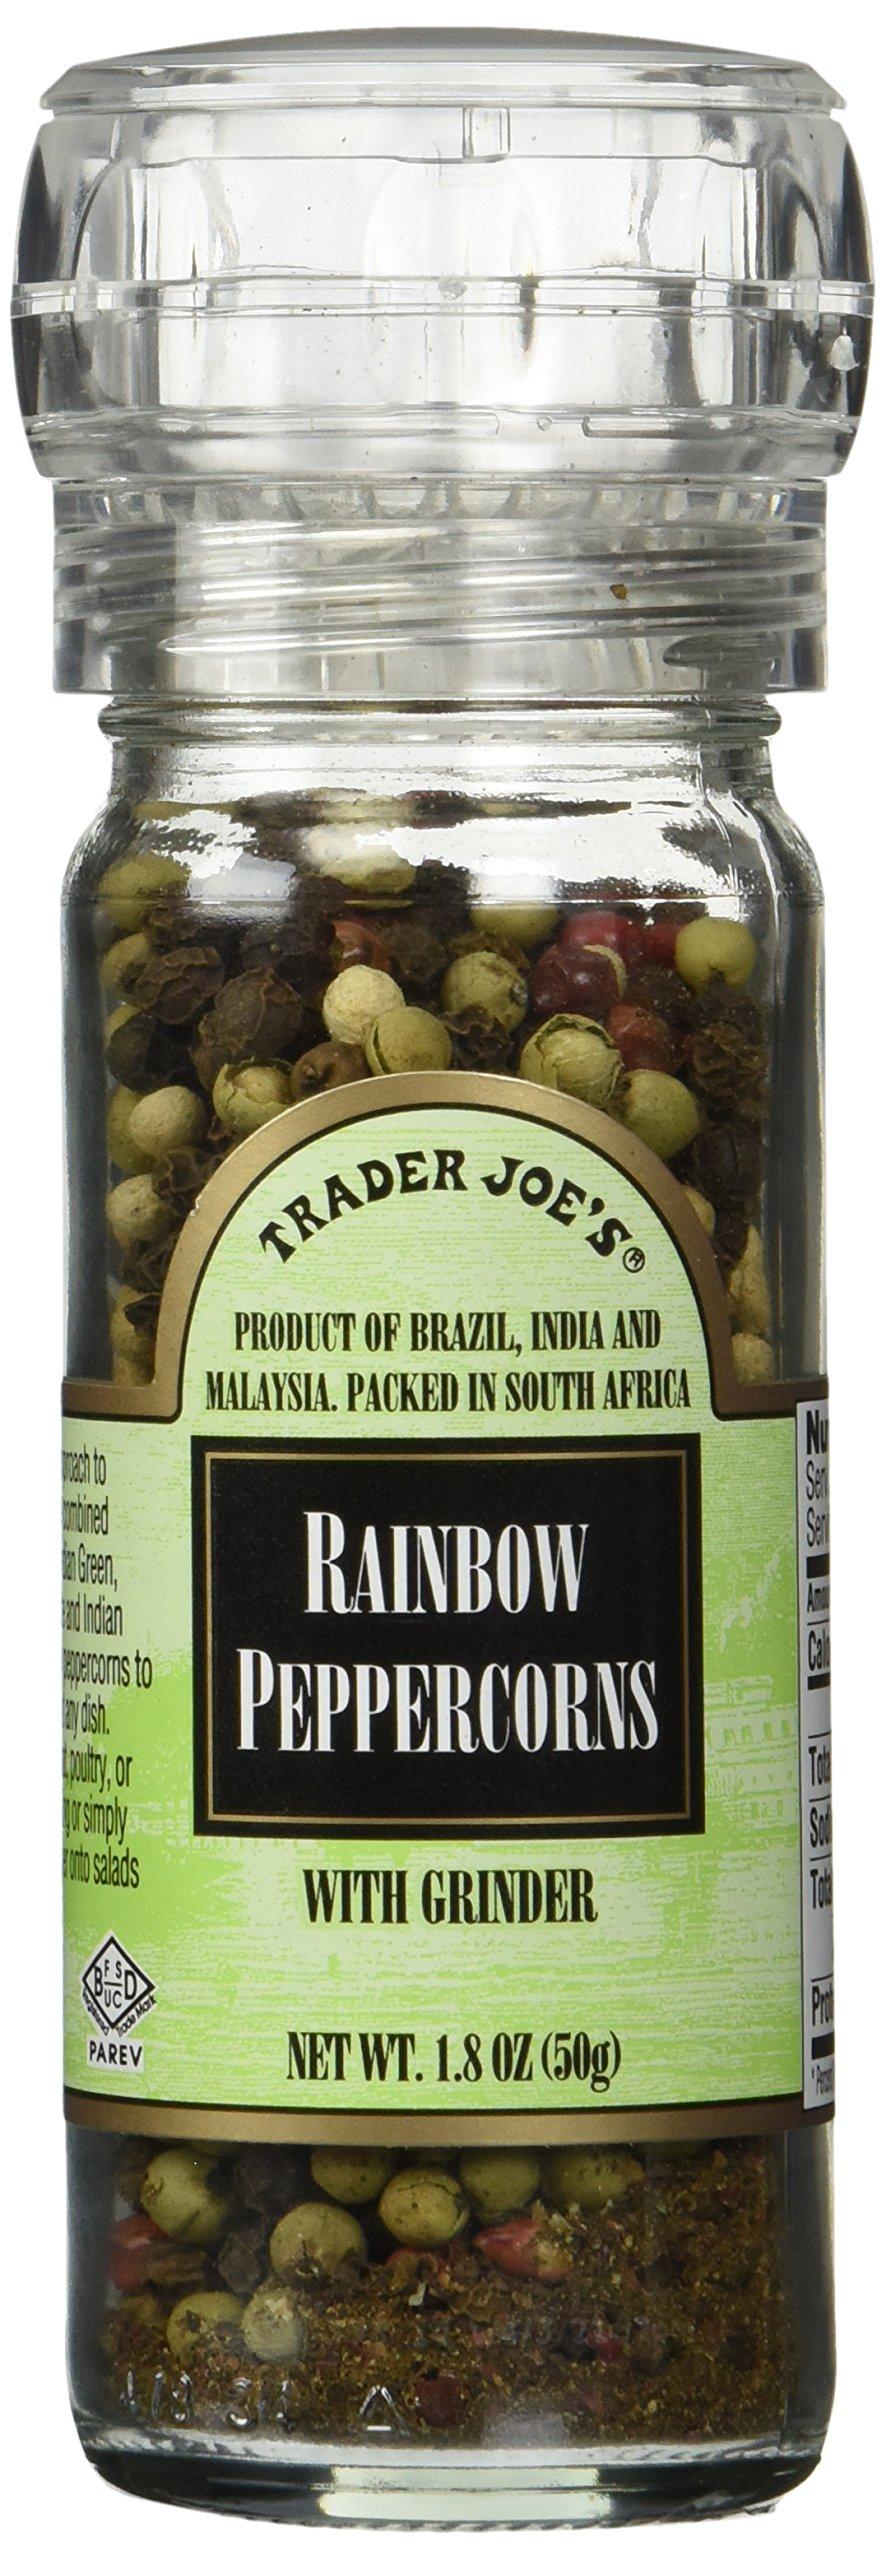 Trader Joe's Rainbow Peppercorns , a Mixture of Brazilian Pink,indian Green,malaysian White and Indian Black Tellicherry Peppercorns